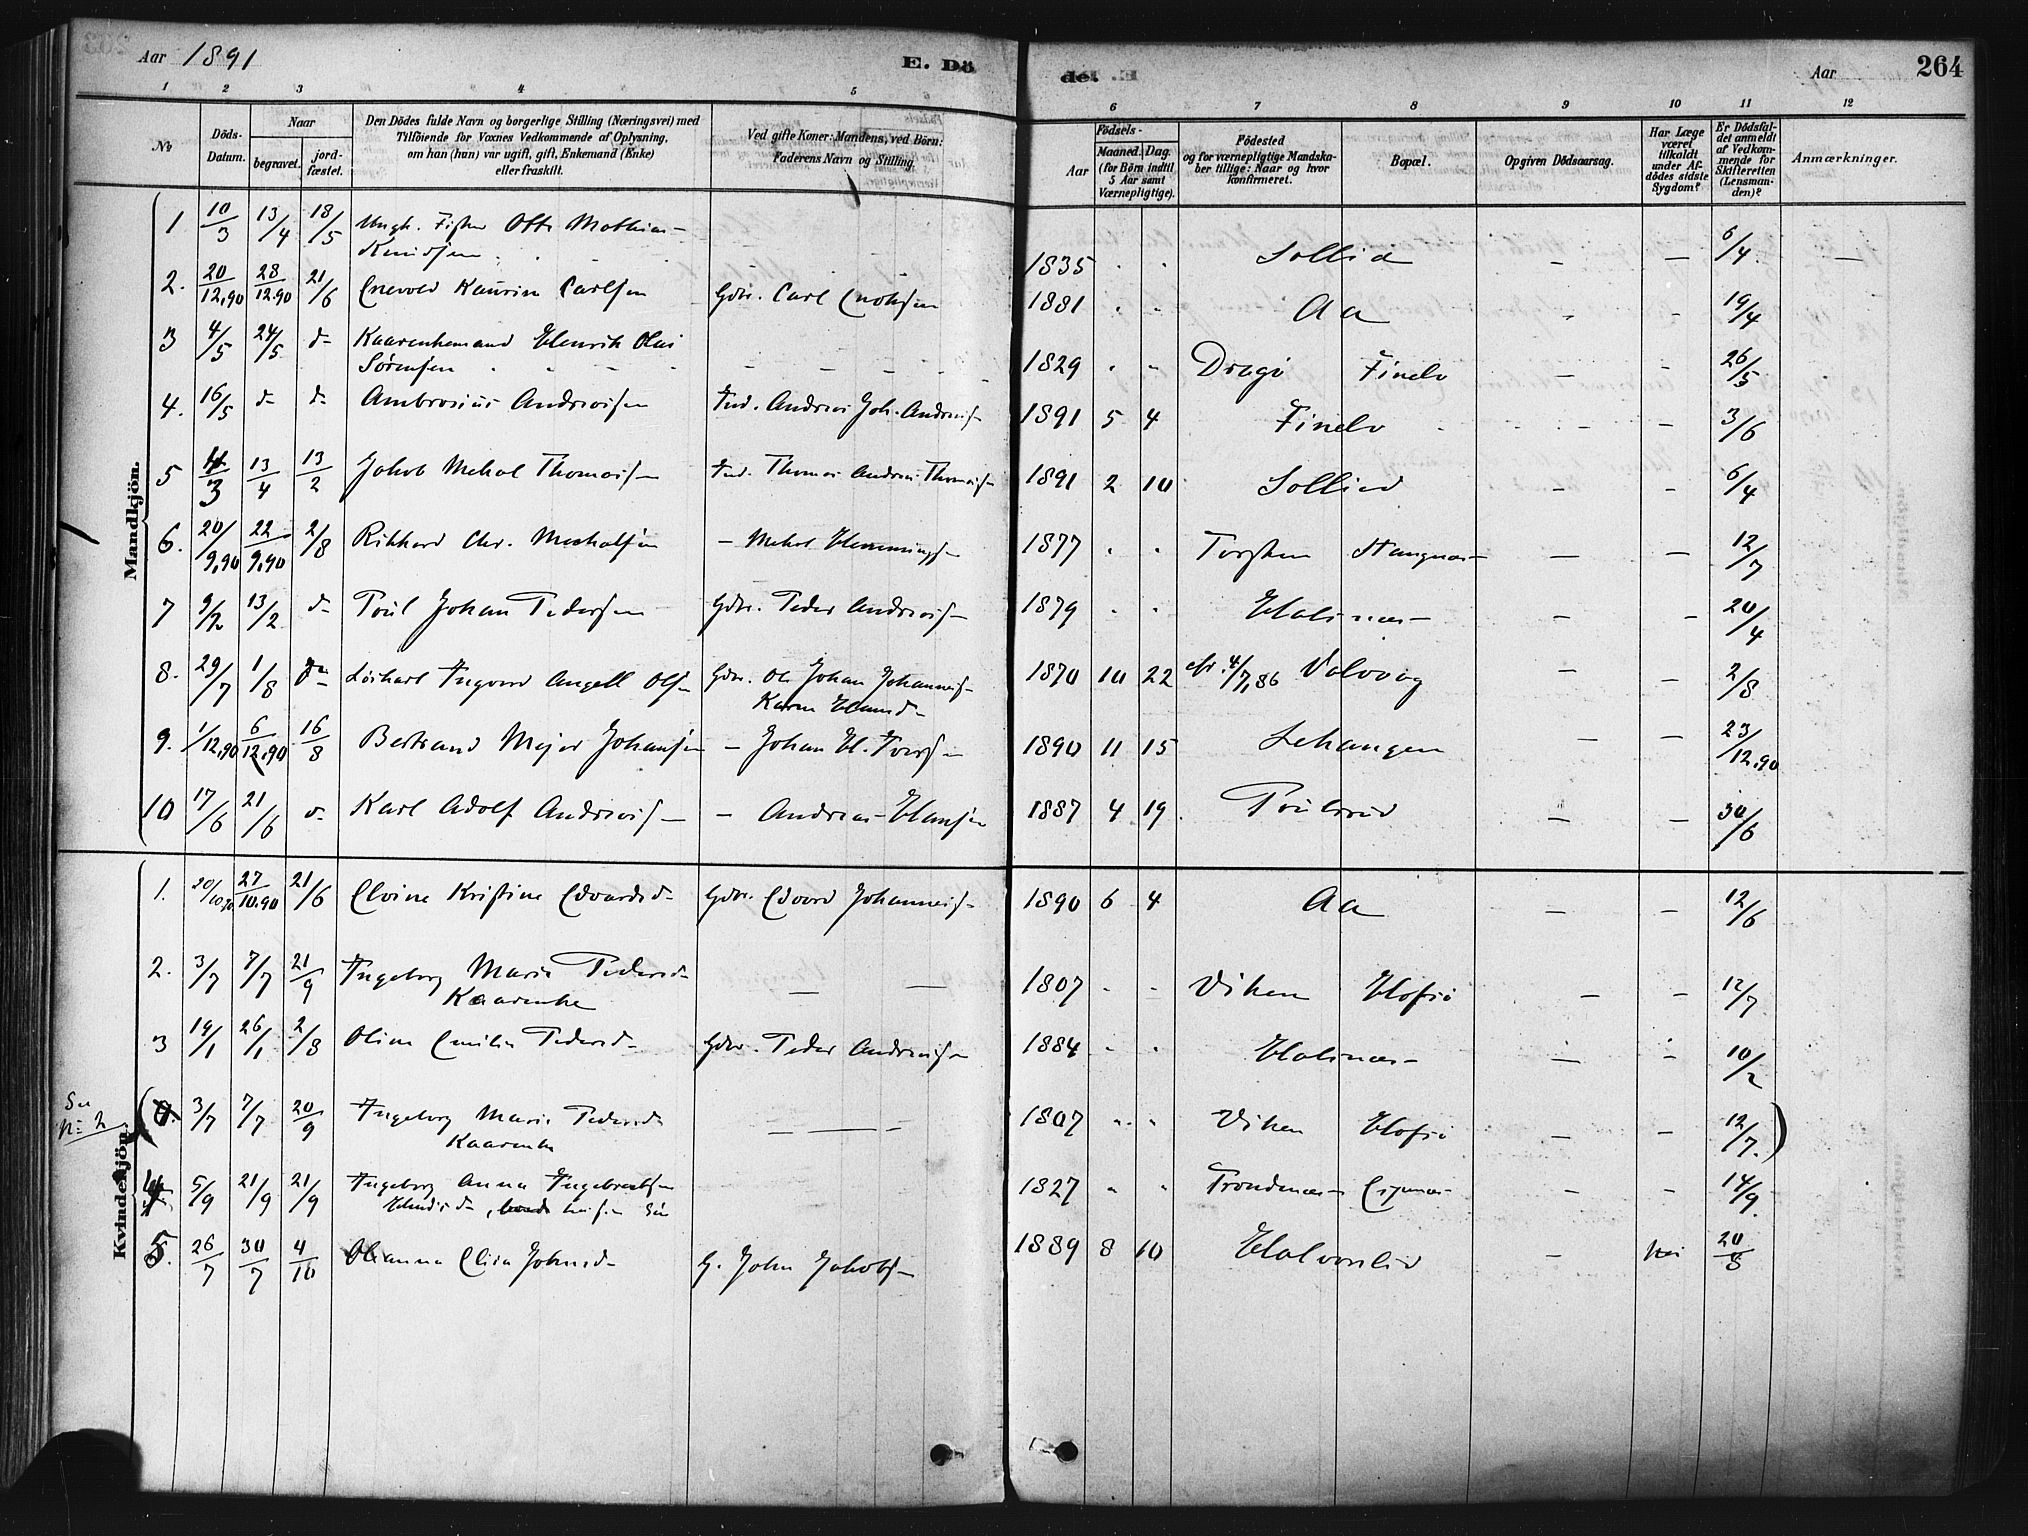 SATØ, Tranøy sokneprestkontor, I/Ia/Iaa/L0009kirke: Ministerialbok nr. 9, 1878-1904, s. 264